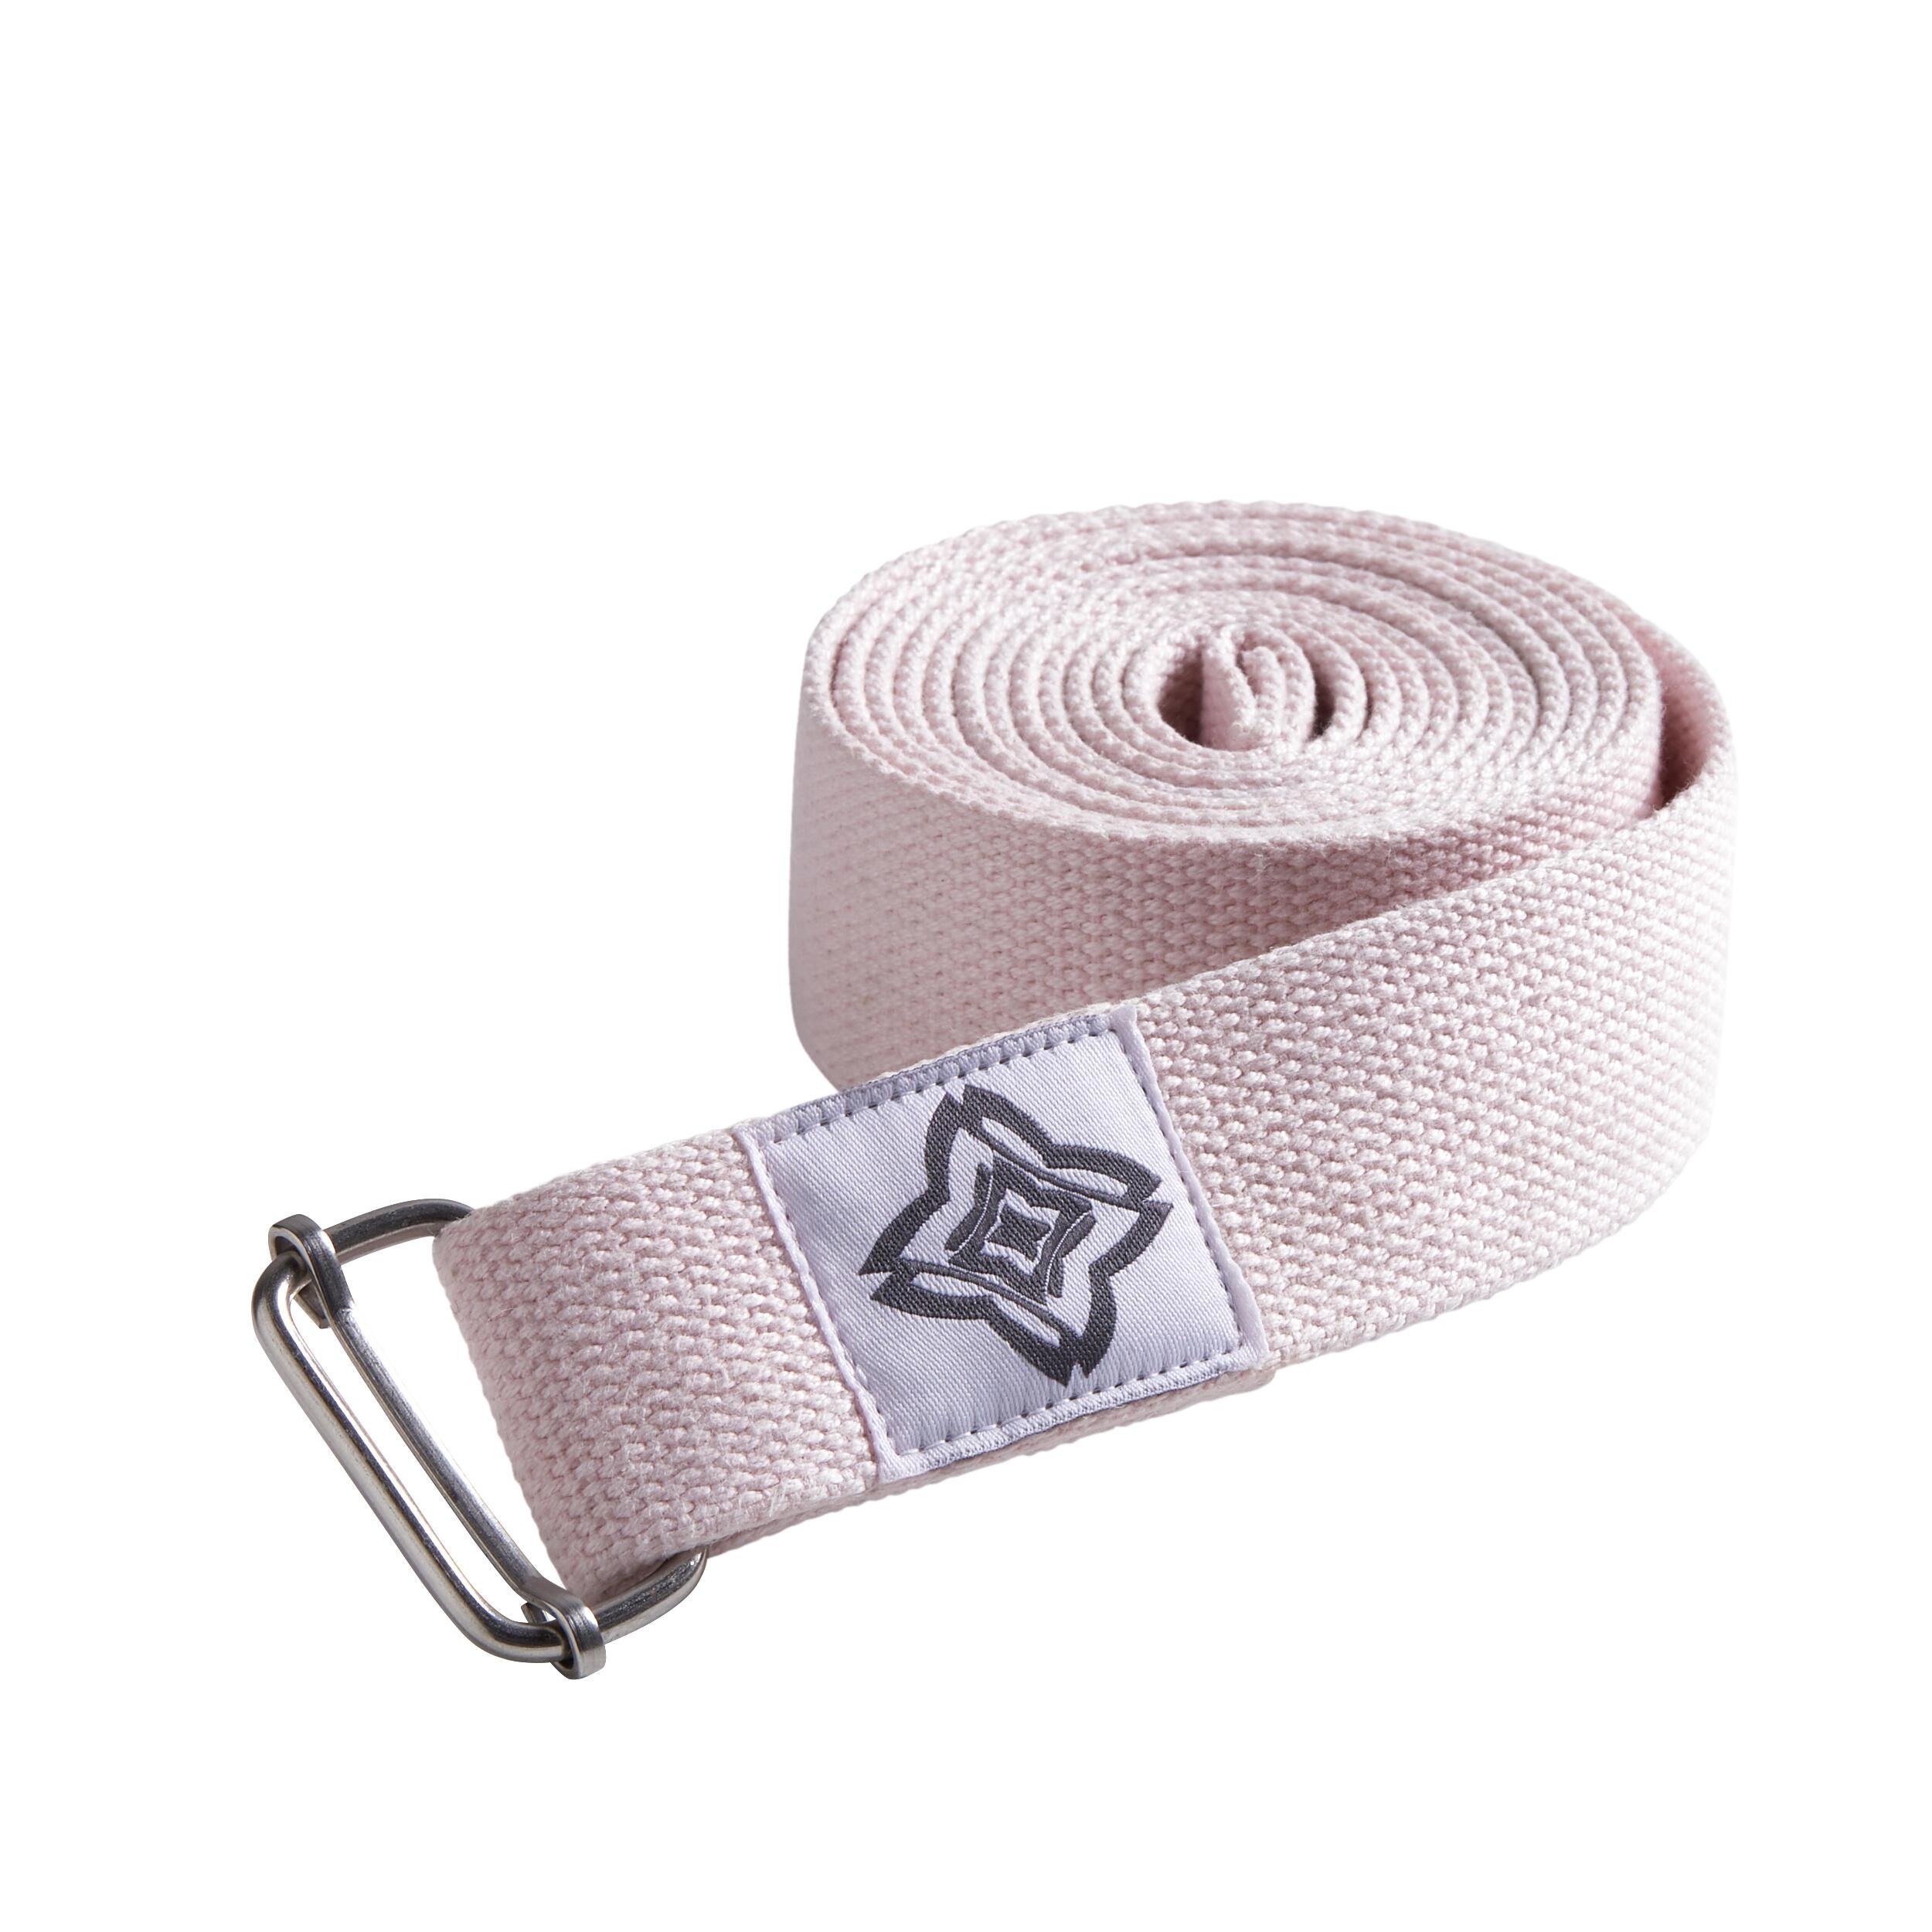 Curea Yoga Bumbac la Reducere poza